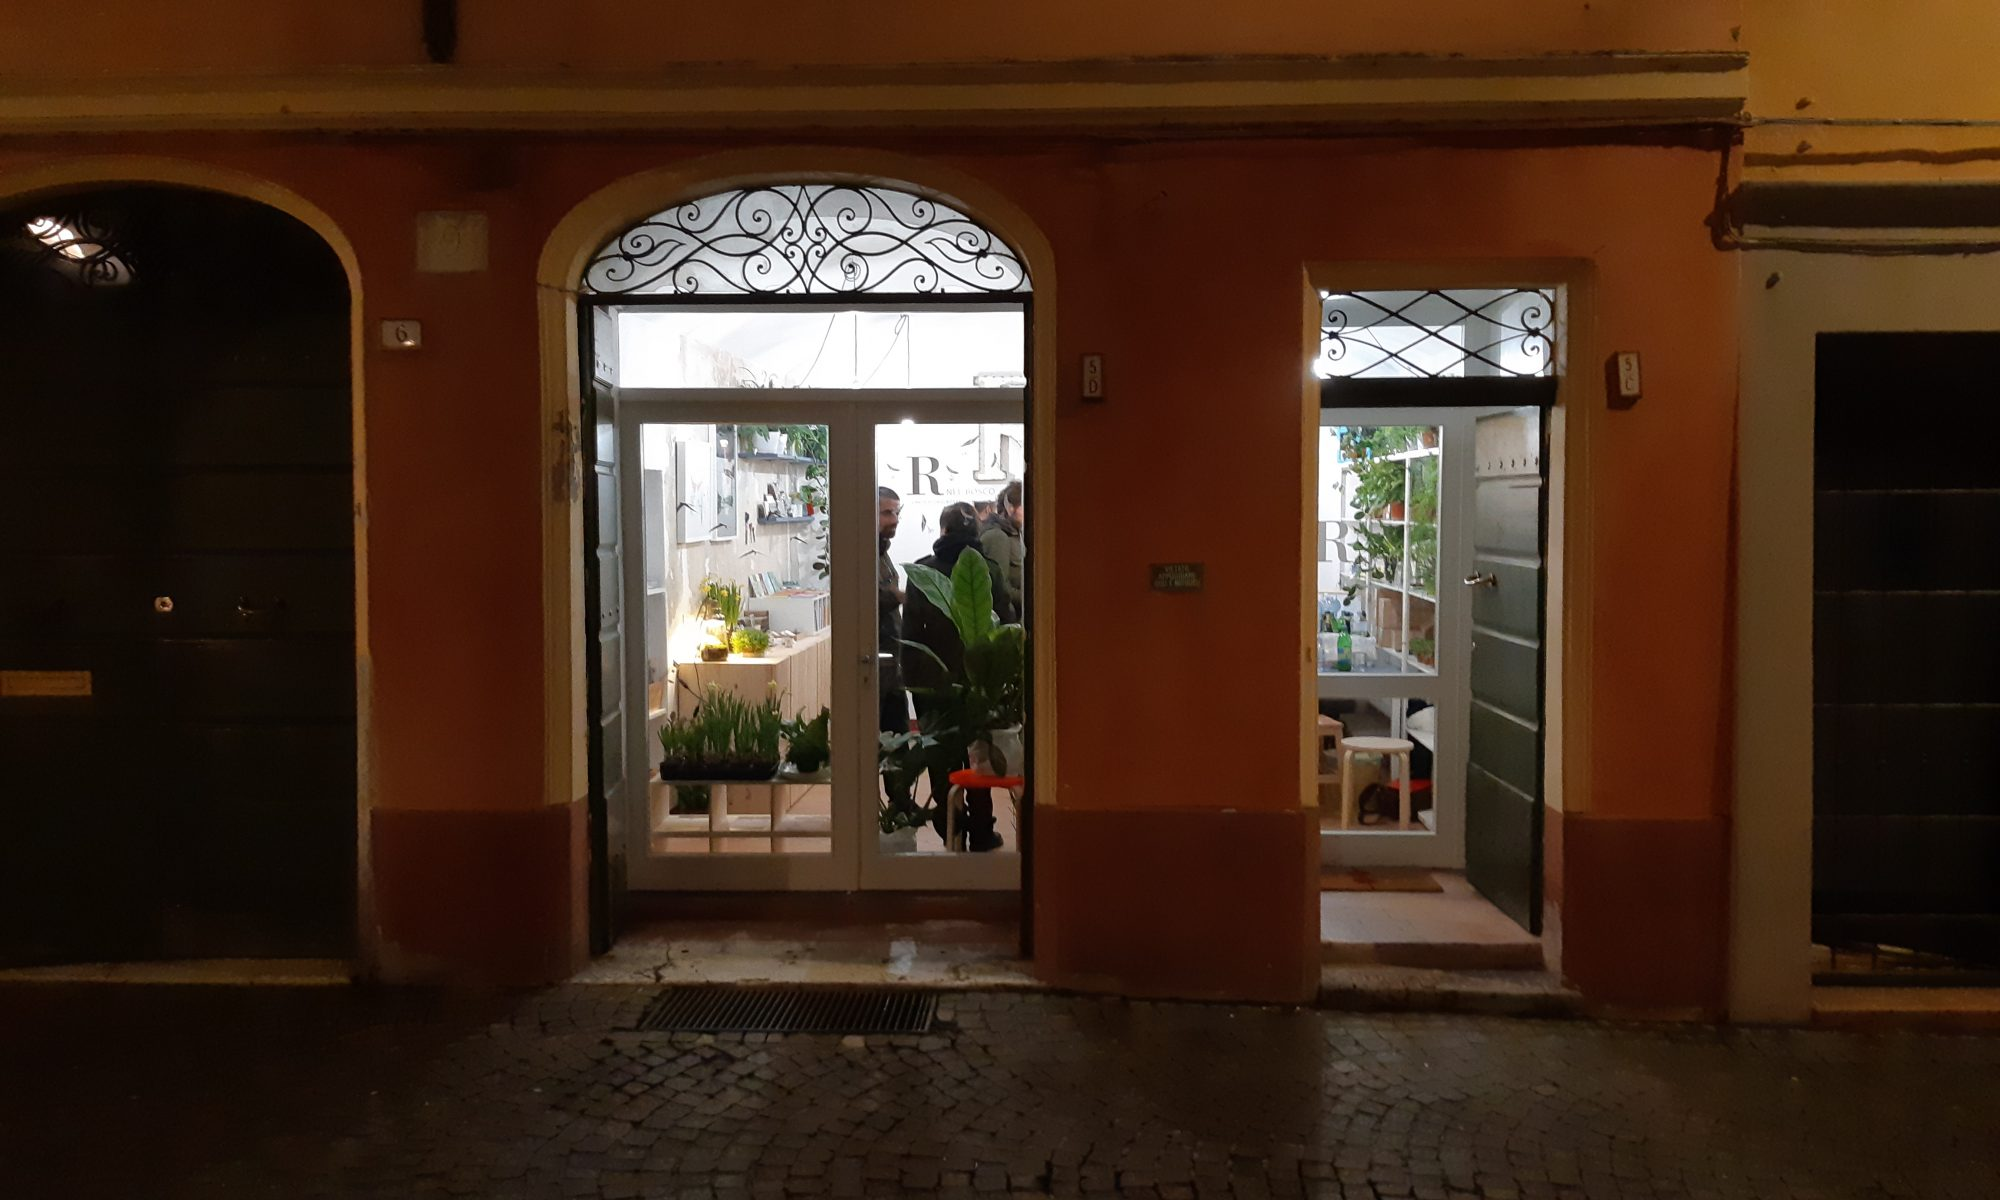 radici - R nel bosco - Reggio Emilia